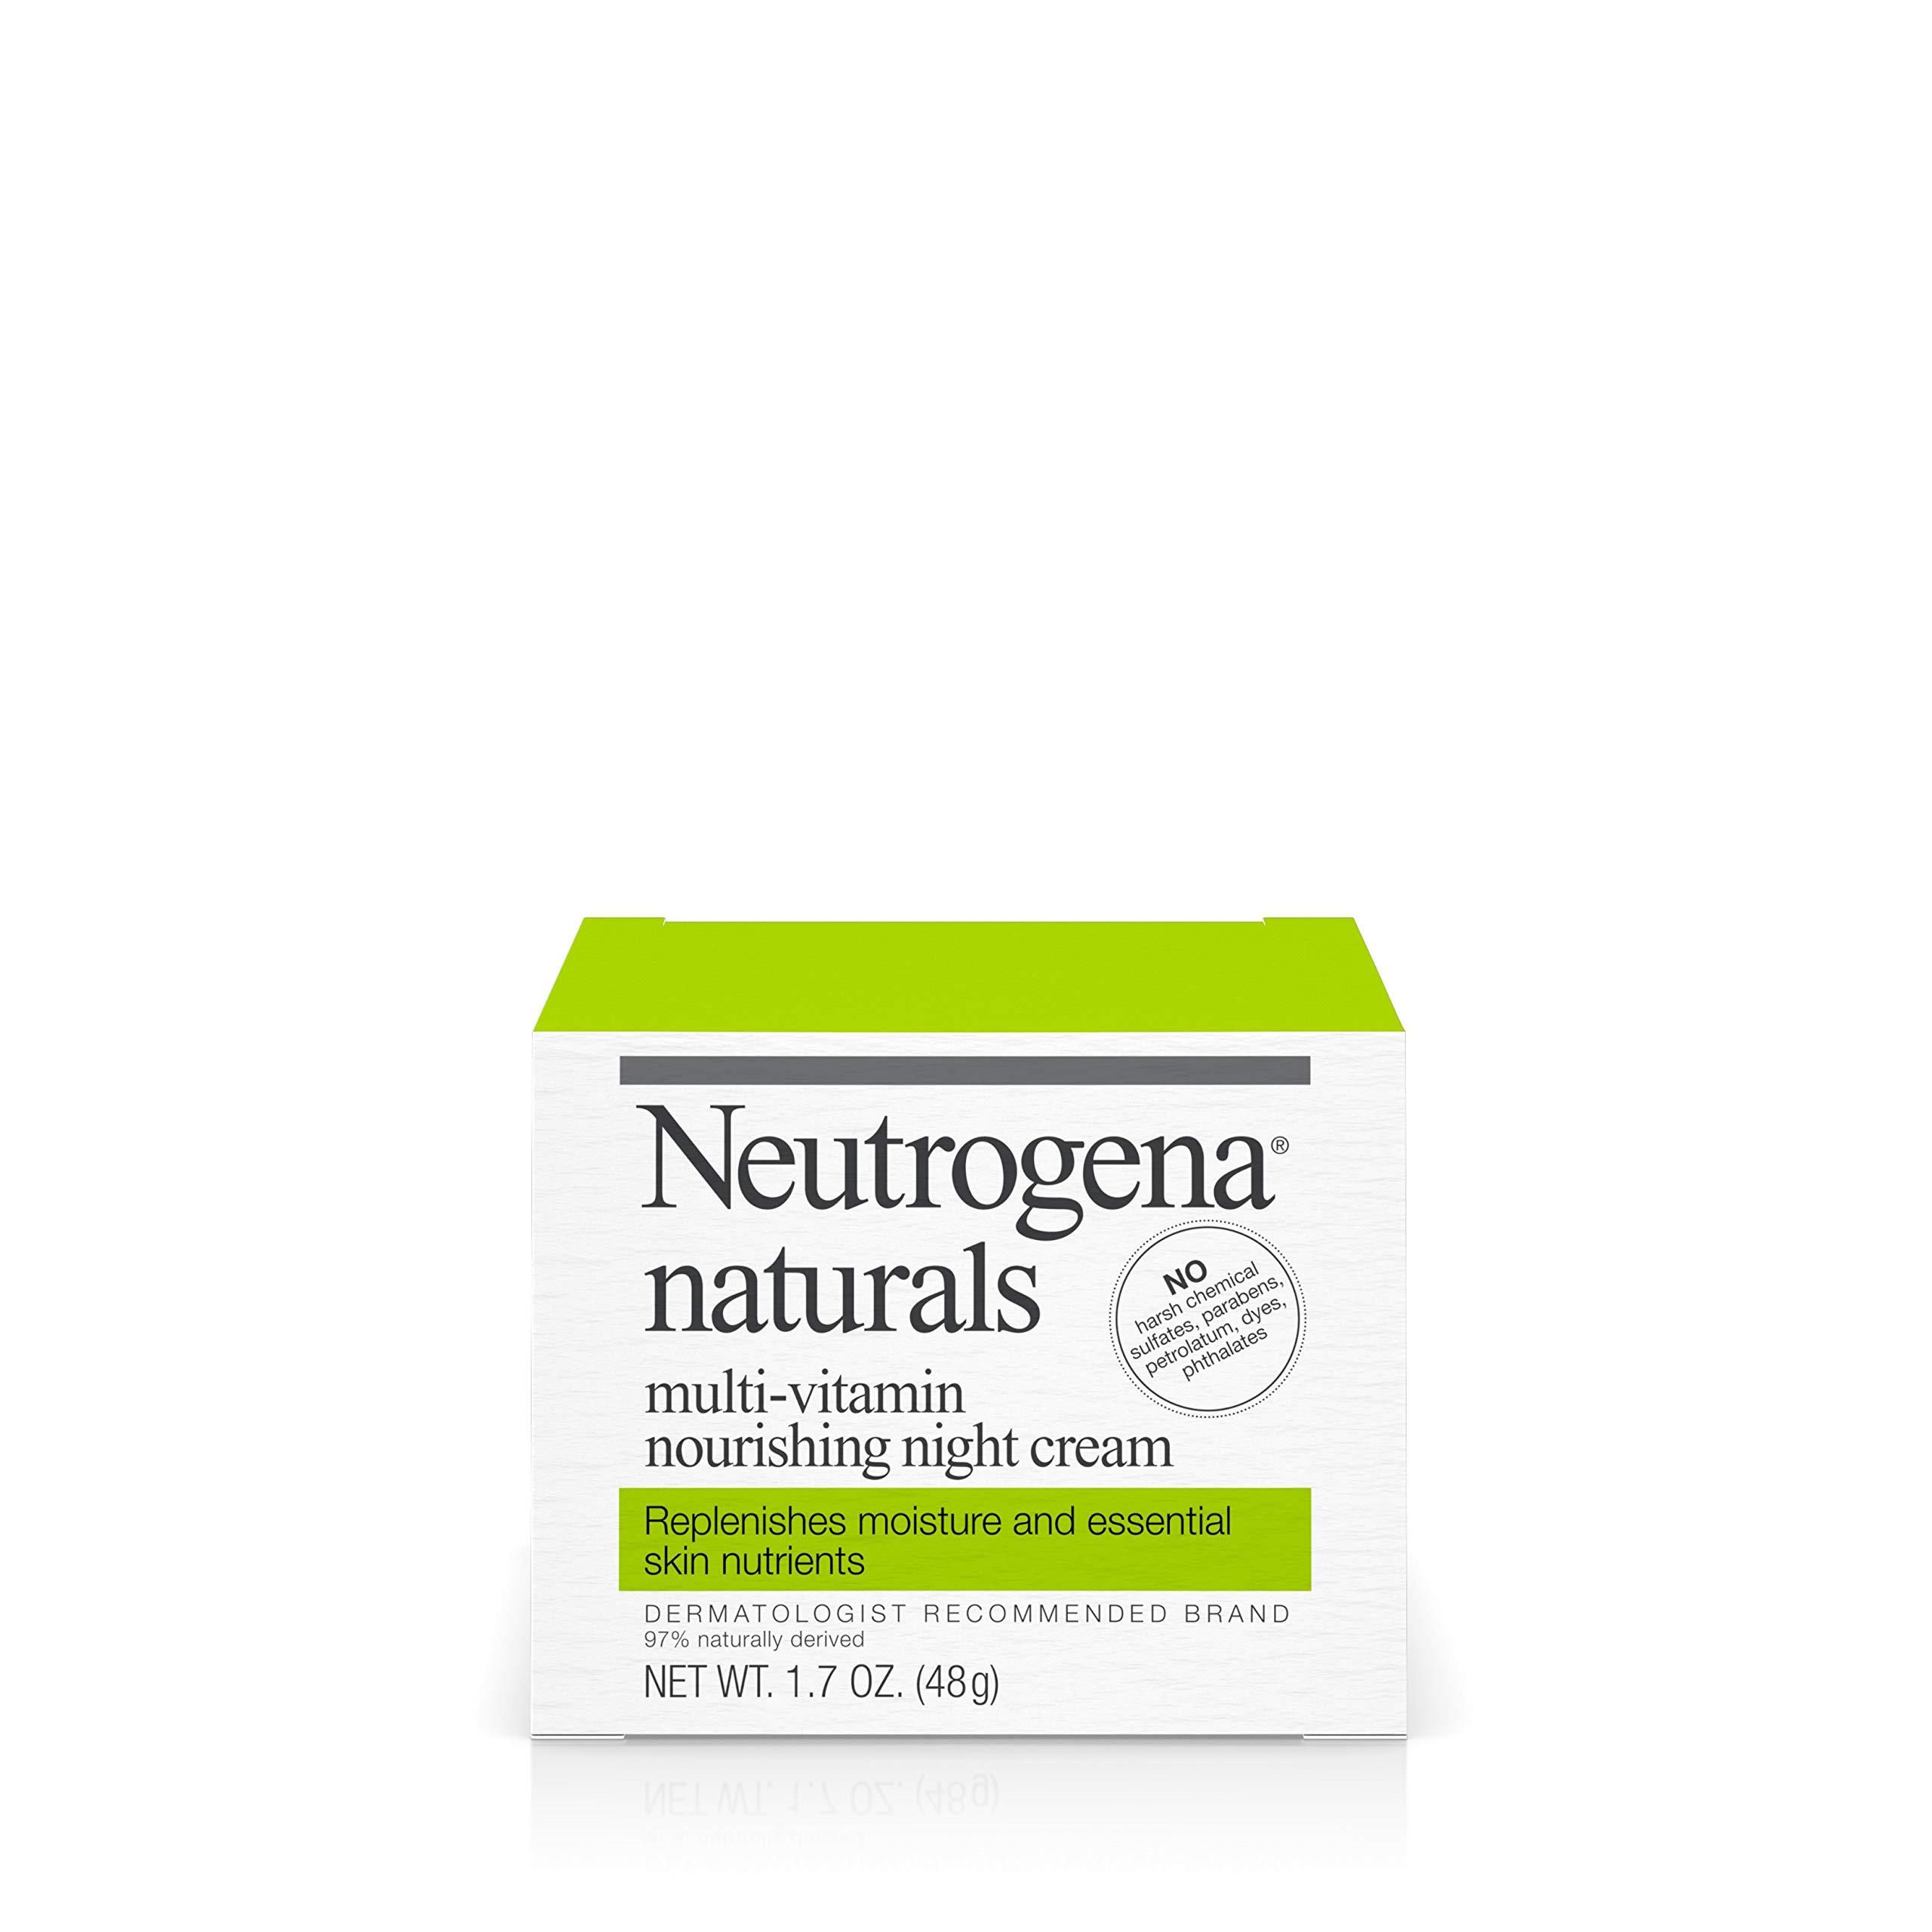 Neutrogena Naturals Multi-Vitamin Moisturizing & Nourishing